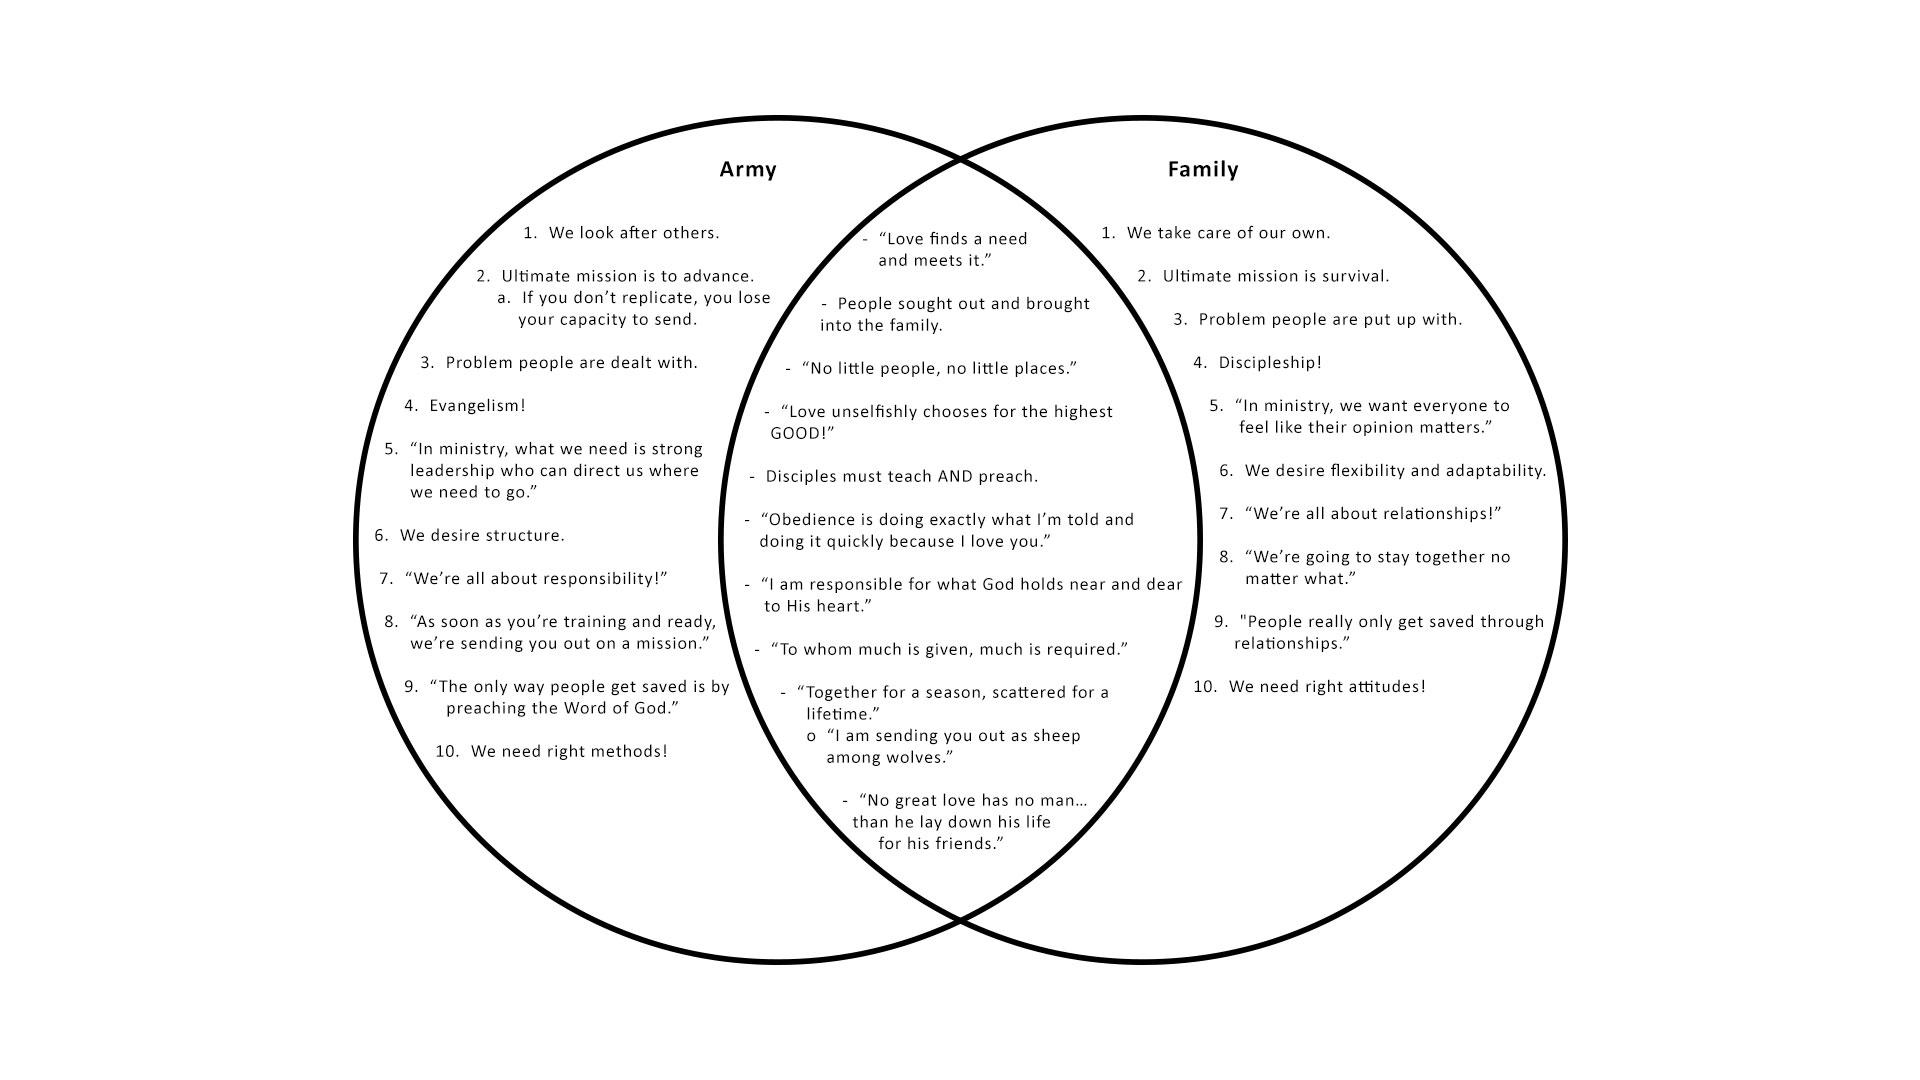 Family vs. Army Venn Diagram | Chi Alpha Campus Ministries on carroll diagram, school diagram, mexico diagram, john venn, circle diagram, compare and contrast diagram, cluster diagram, blank bubble diagram, activity diagram, er diagram, euler diagram, ishikawa diagram, law diagram, sankey diagram, bar diagram, flow diagram, subset diagram, plot diagram, vin diagram, word diagram, box diagram, meiosis diagram, create your own diagram, mathematical diagram,